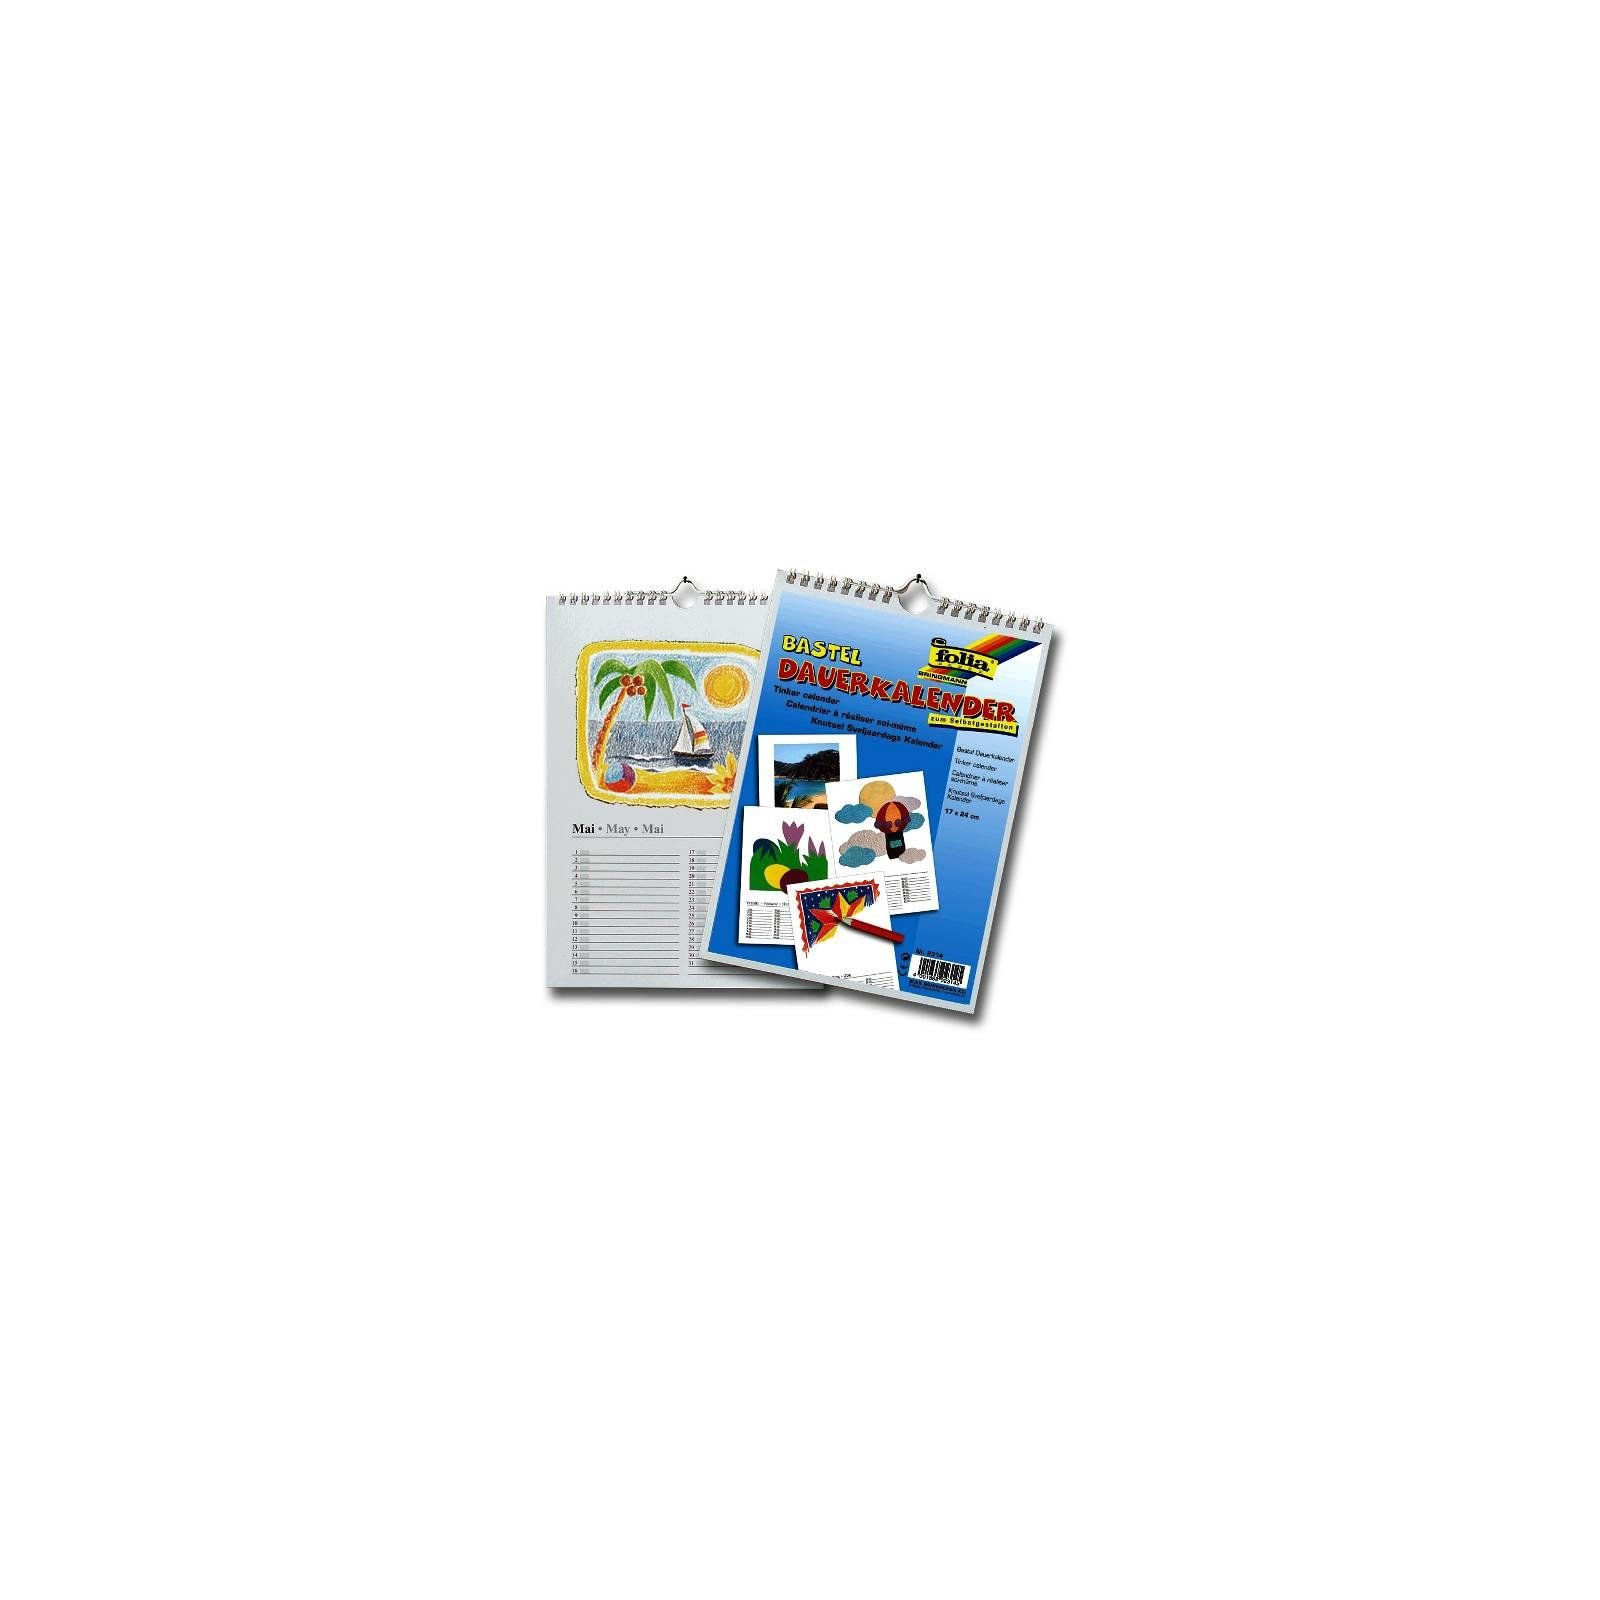 folia Kalender selbst gestalten Basteln Spiralbindung DIN A4 weiß Fotokalender